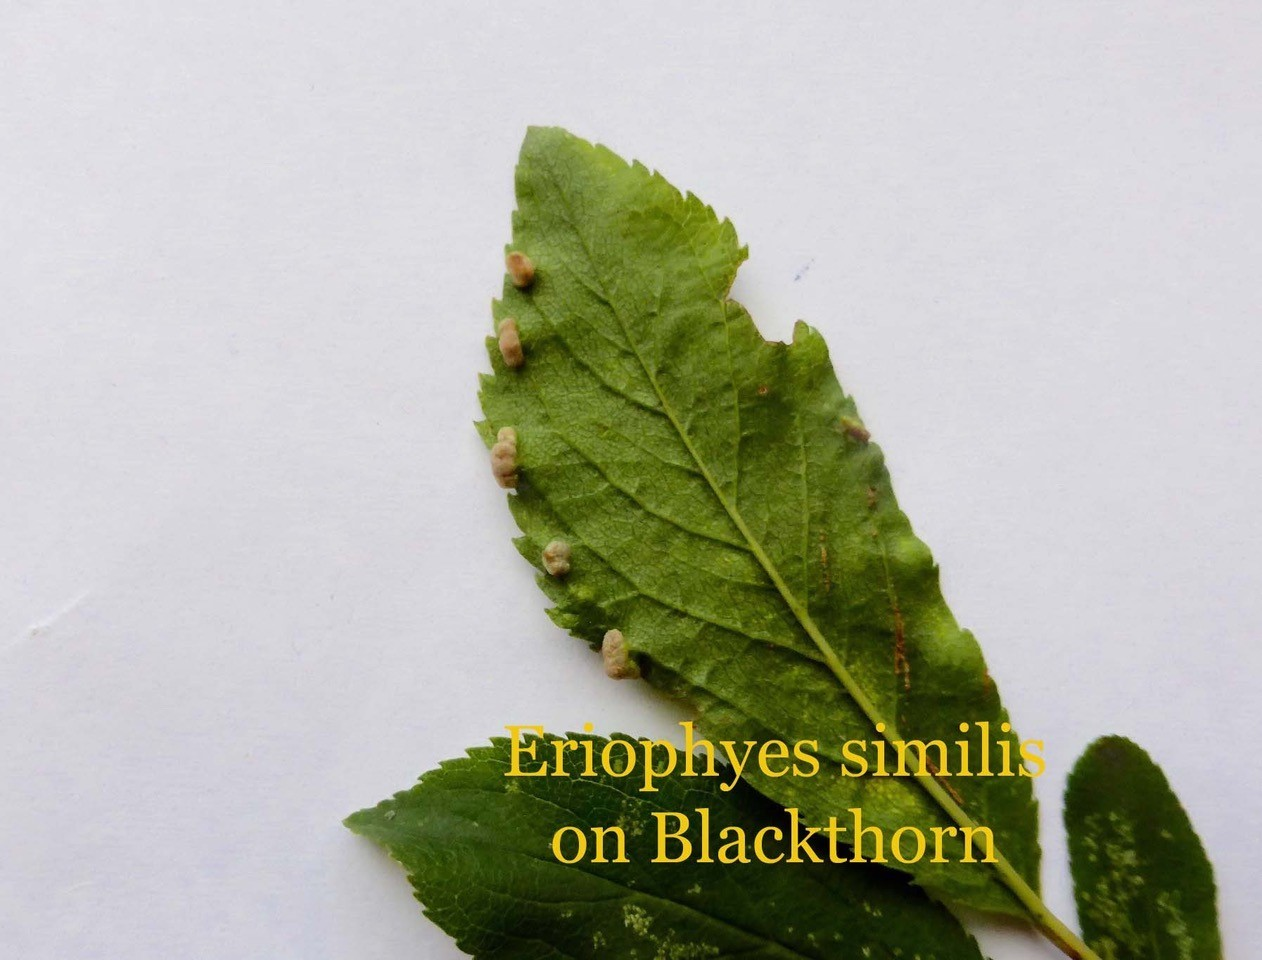 Eriophyes similis (mite) on Blackthorn, Sandal Beat Wood